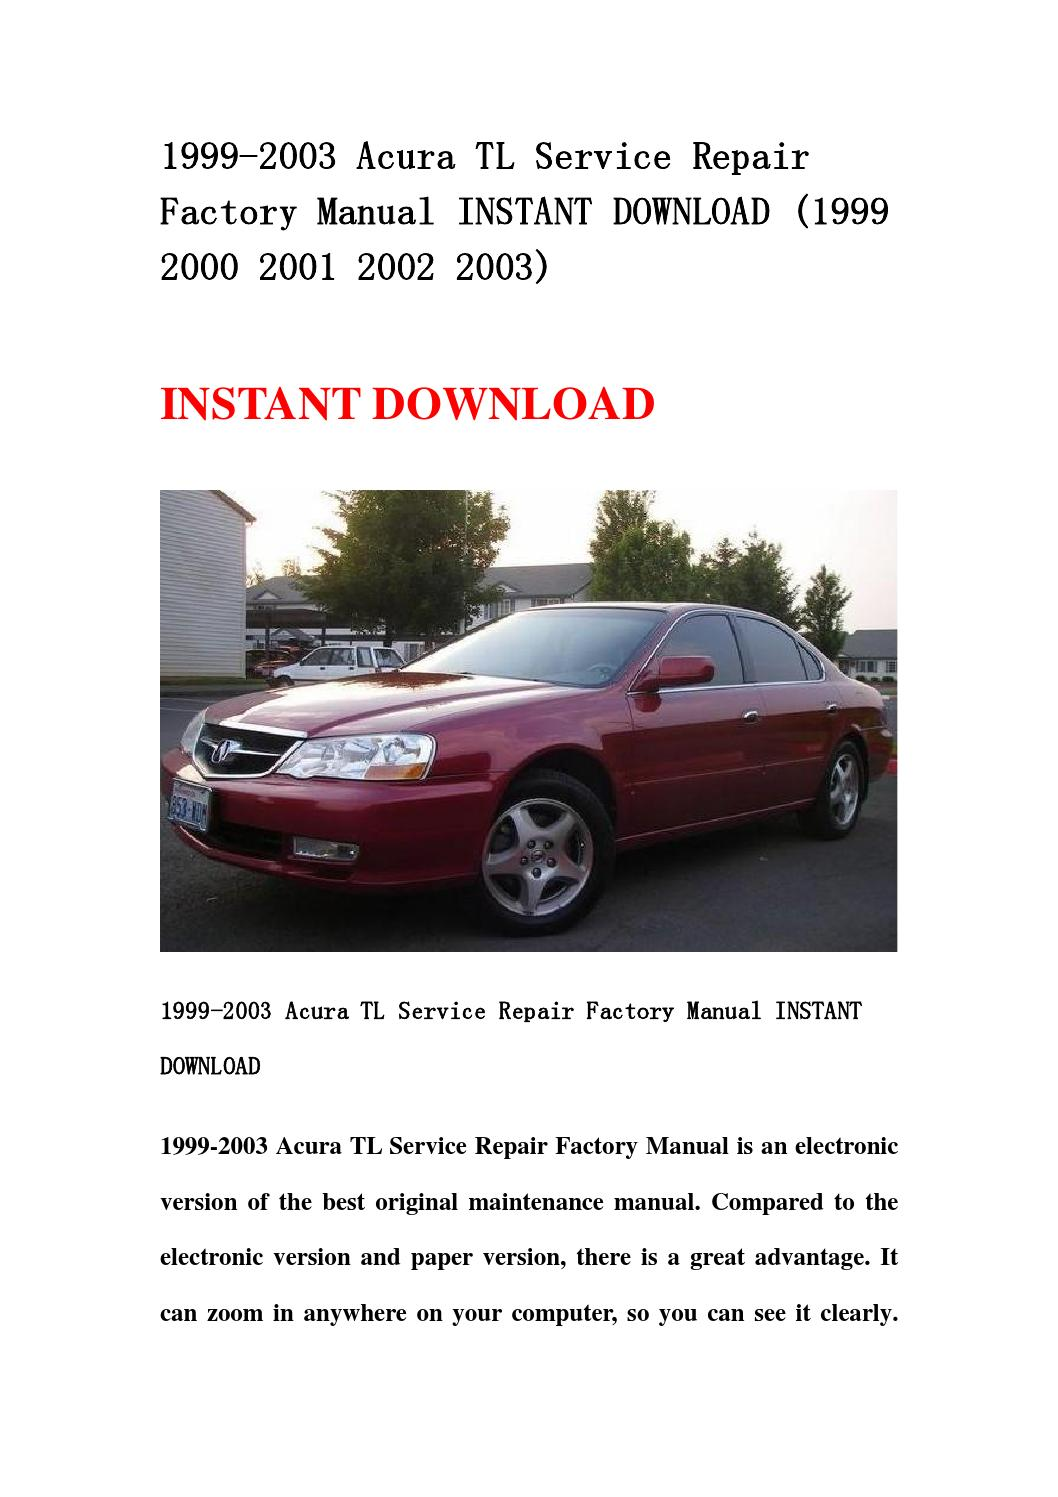 haynes auto repair manual free pdf